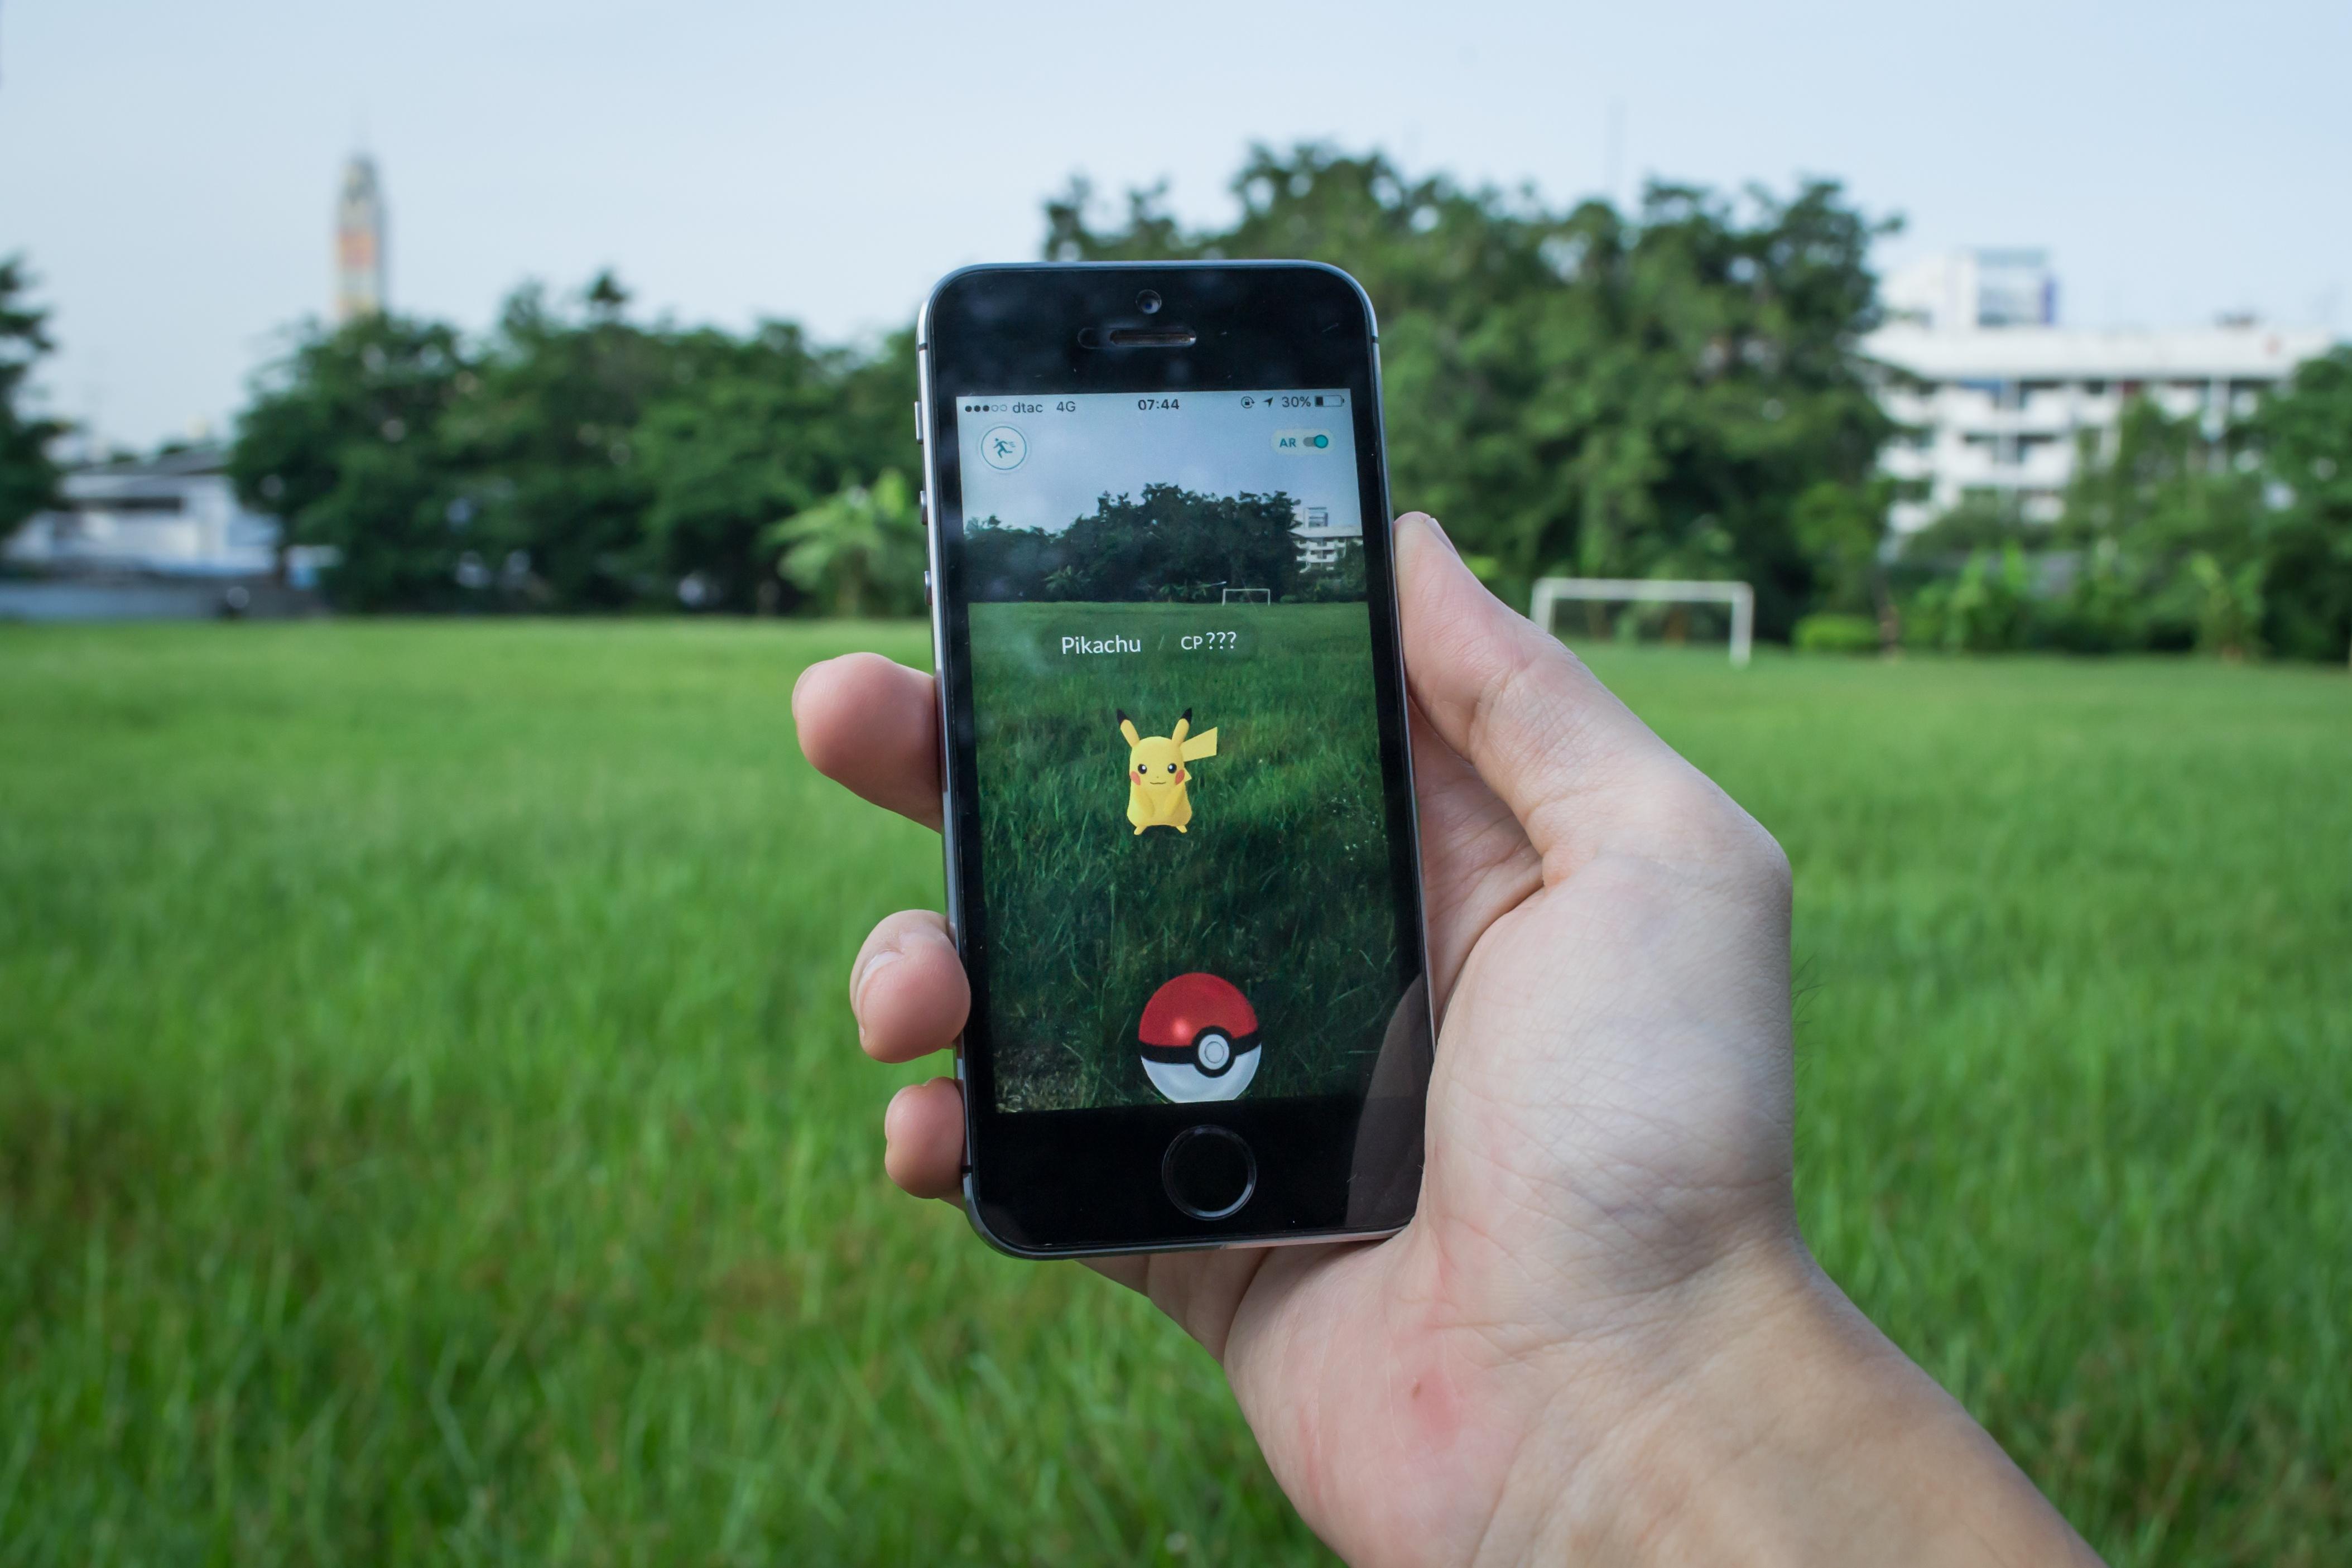 Pokemon-Go-Pikachu-Location-Data.jpg